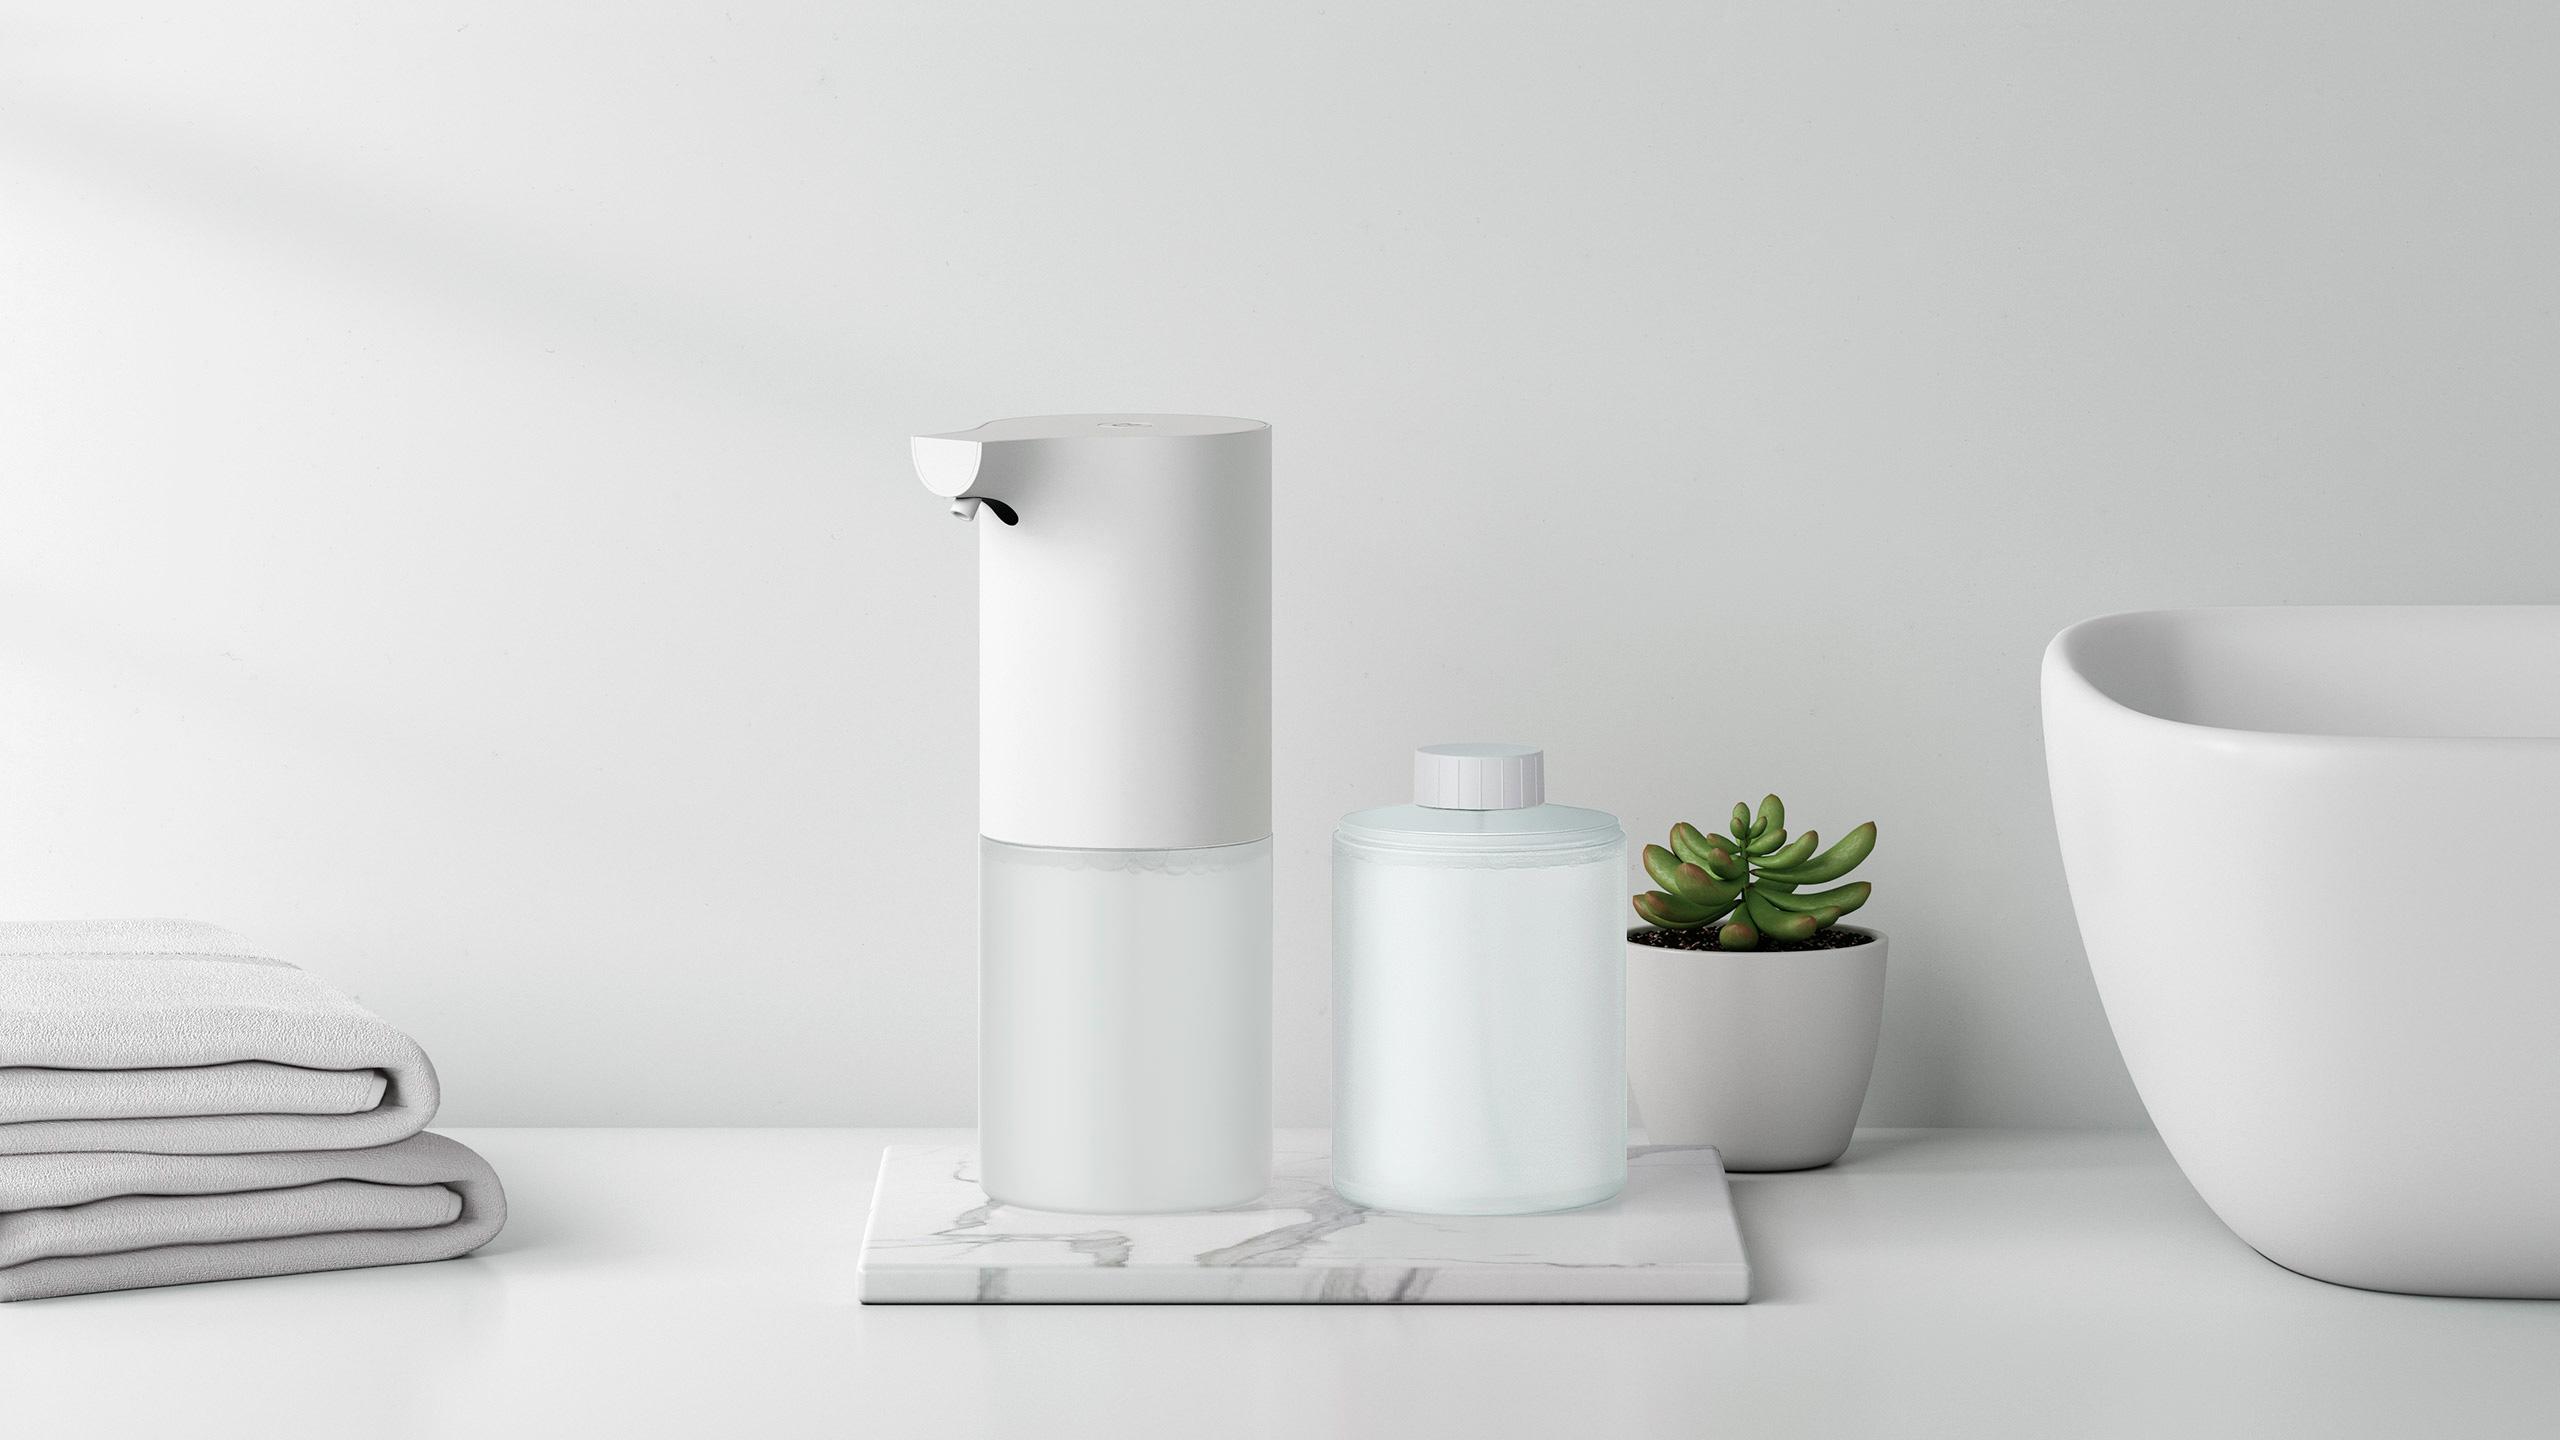 Сенсорная мыльница Xiaomi Mijia Automatic Foam Soap Dispenser